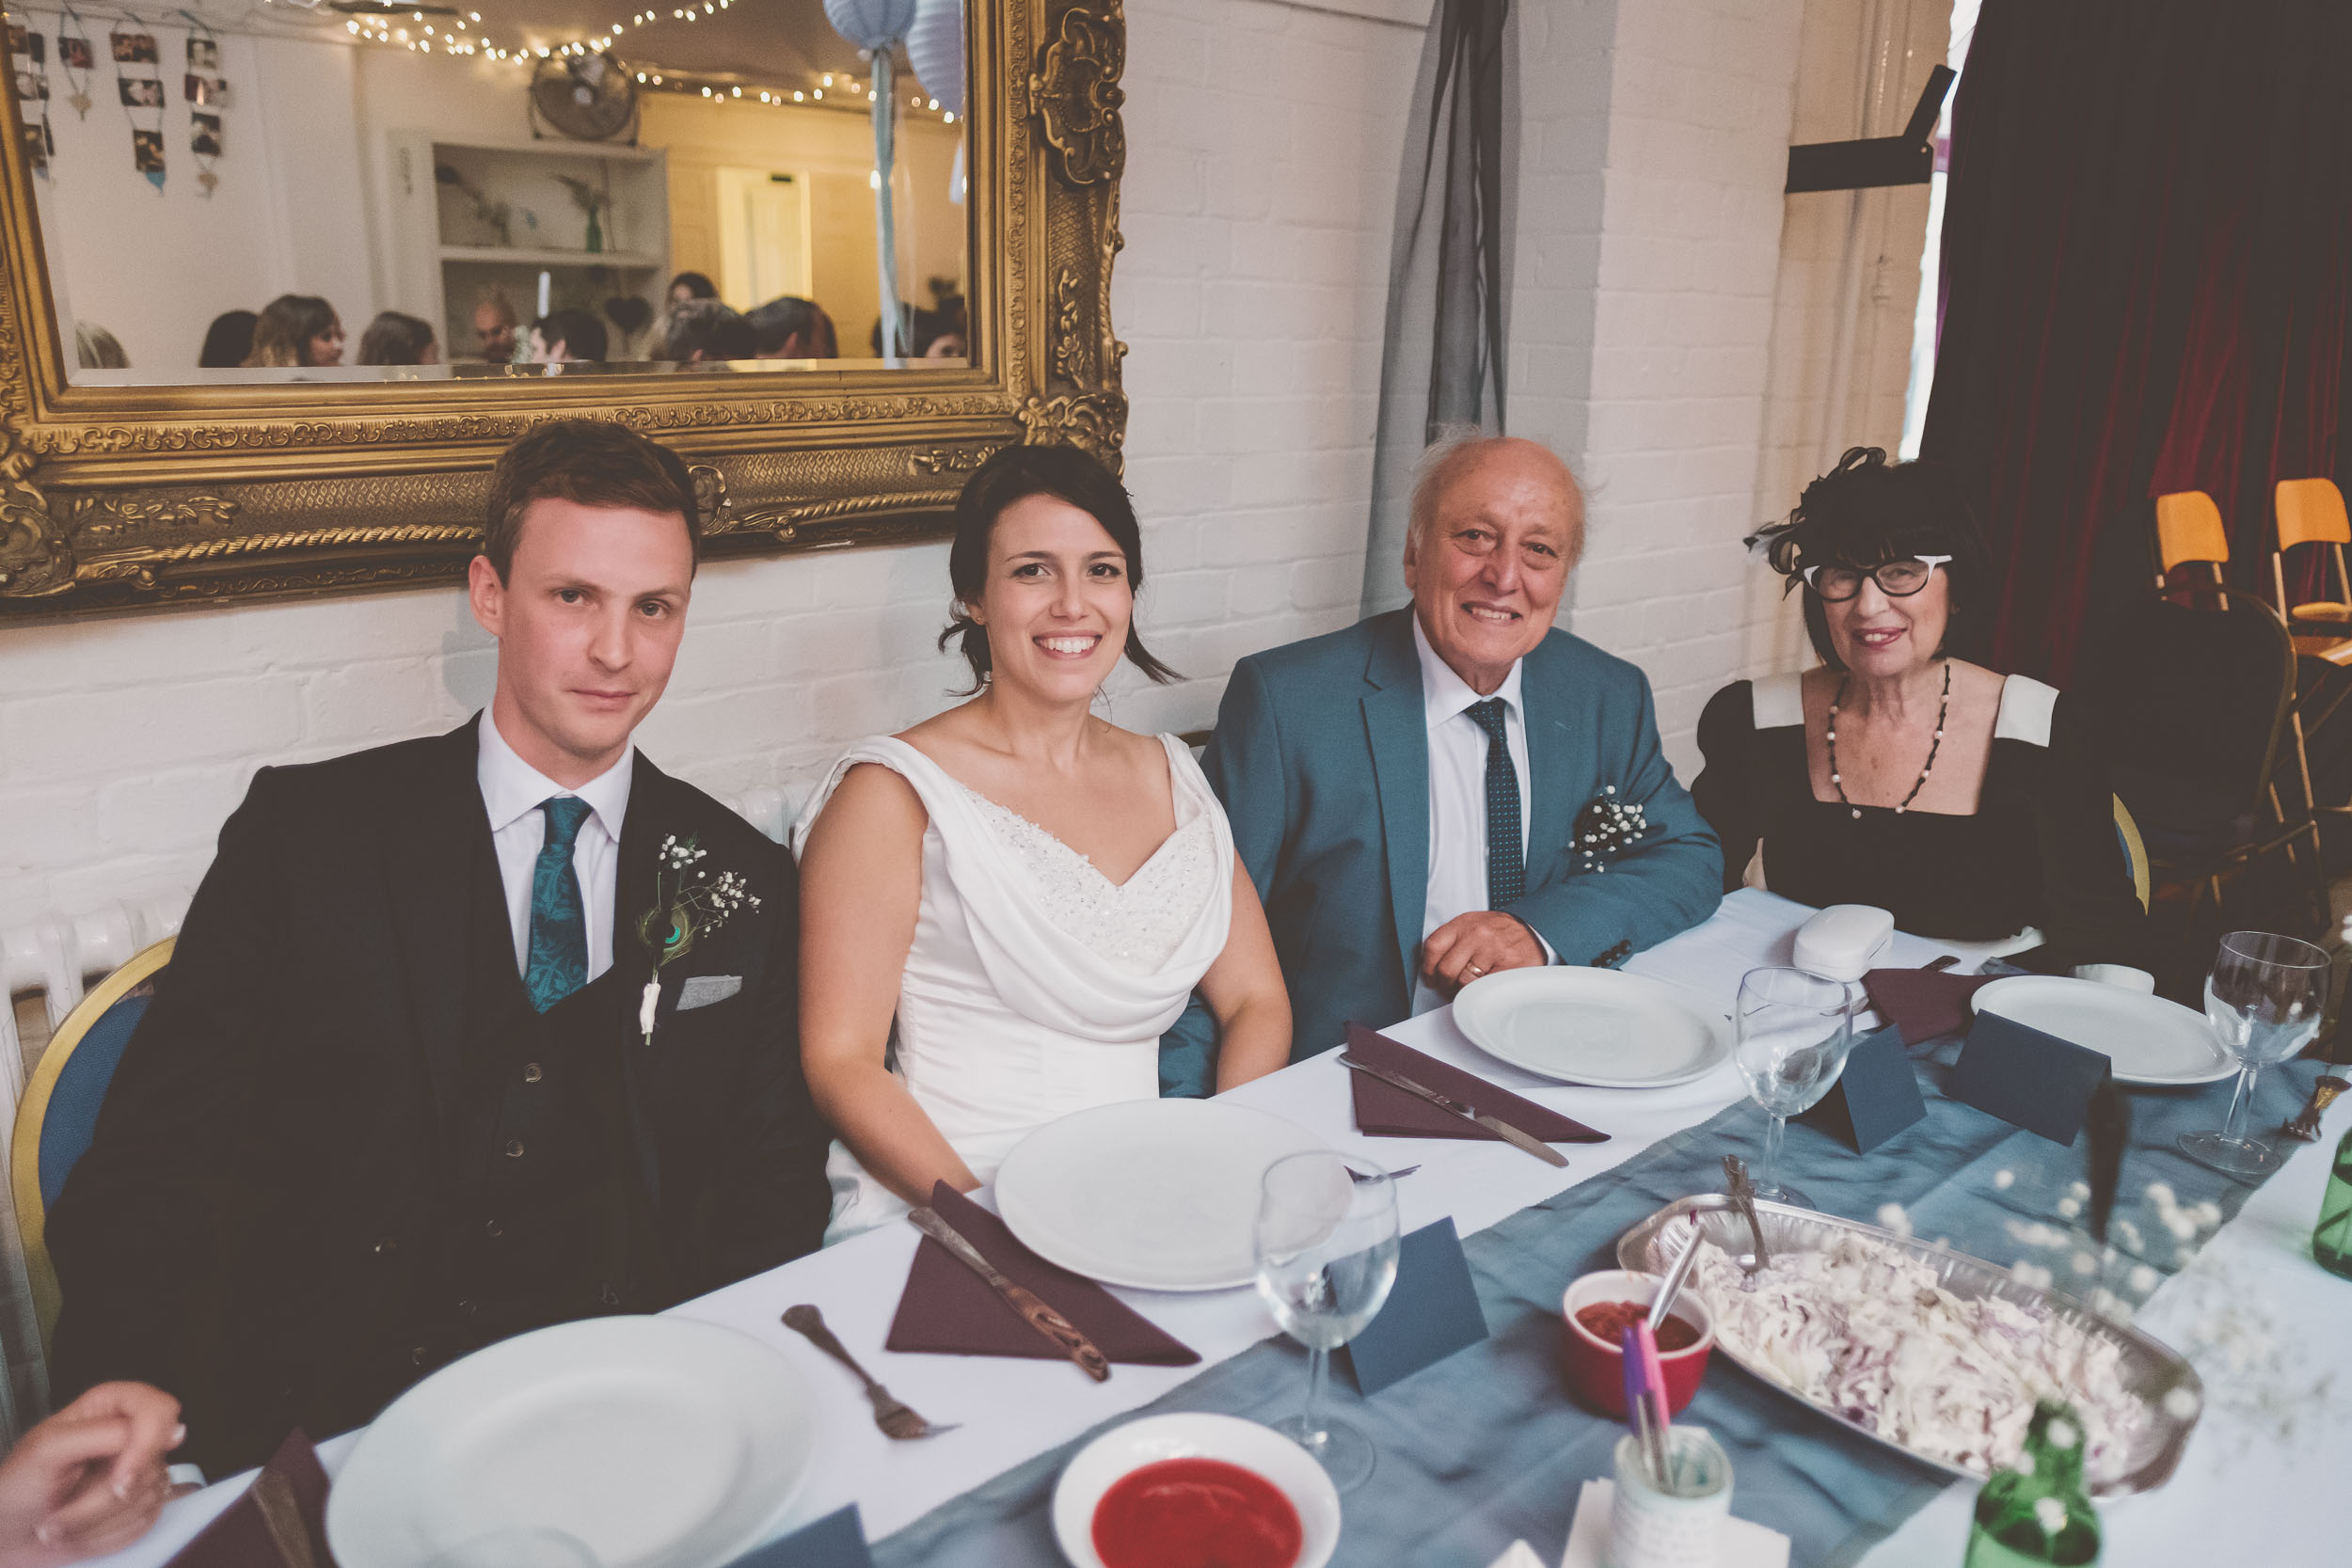 islington-town-hall-4th-floor-studios-wedding349.jpg